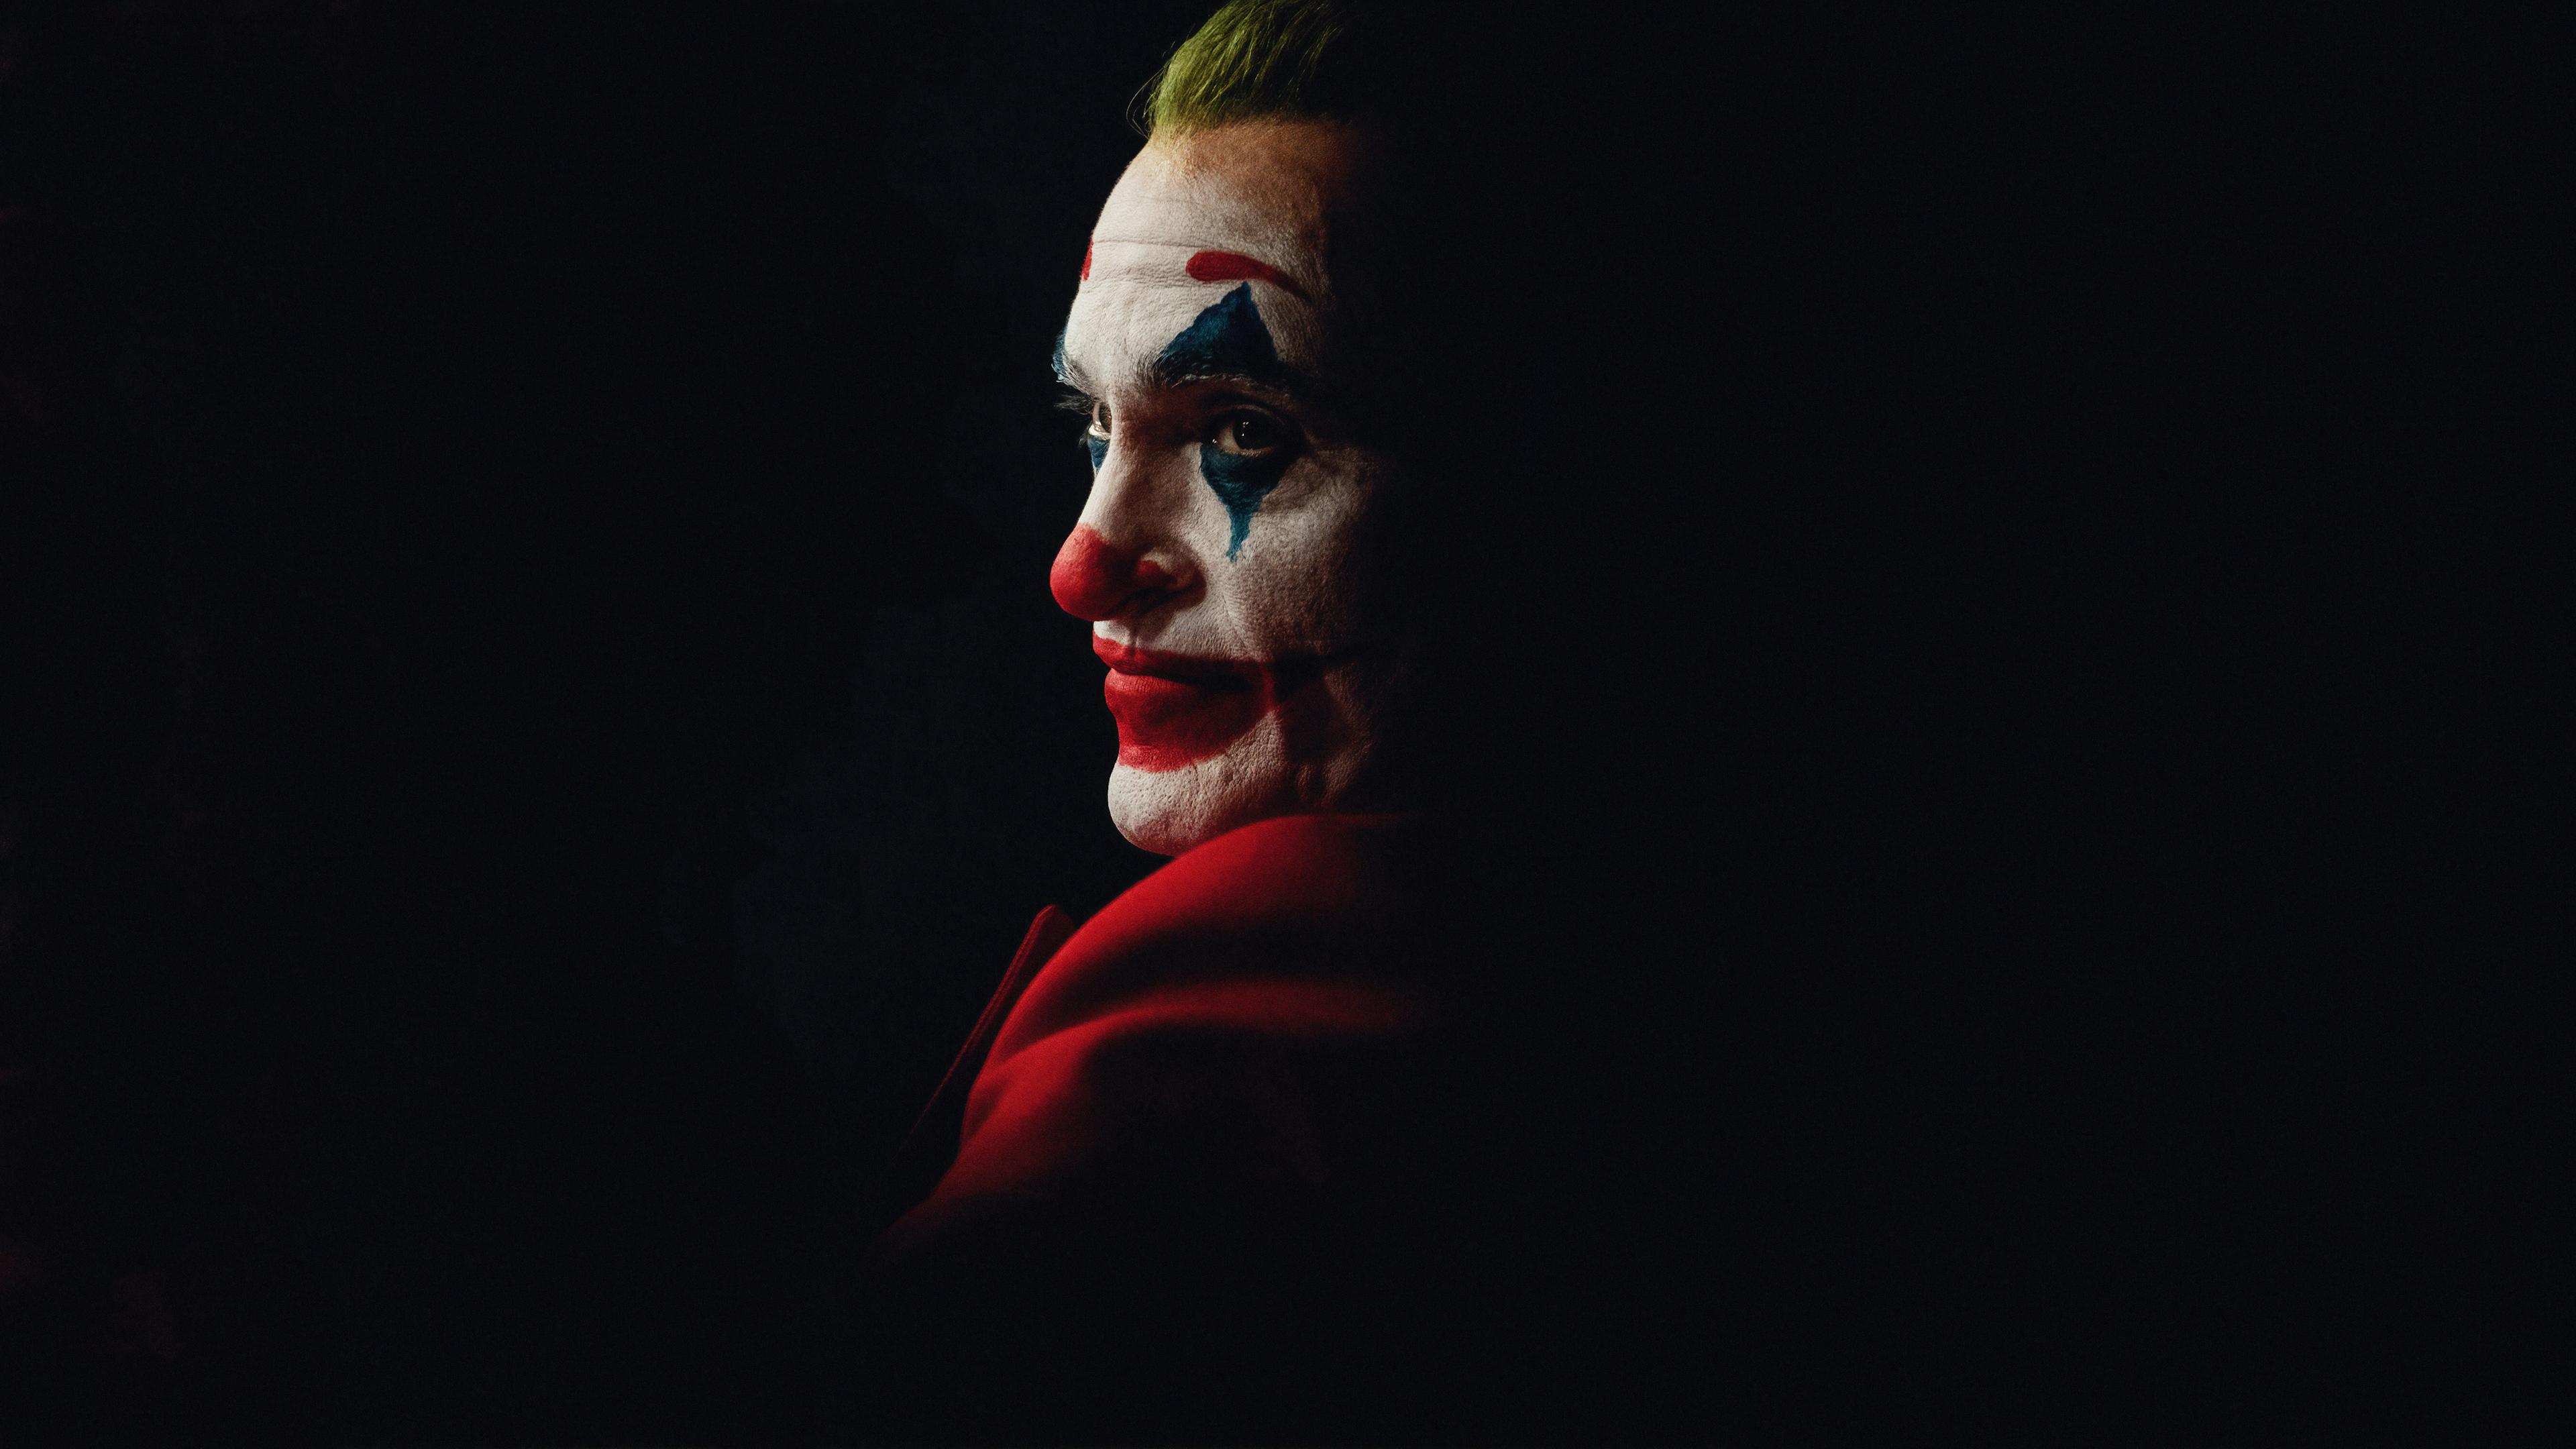 The Joker Joaquin Phoenix Dark 4k Hd Movies 4k Wallpapers